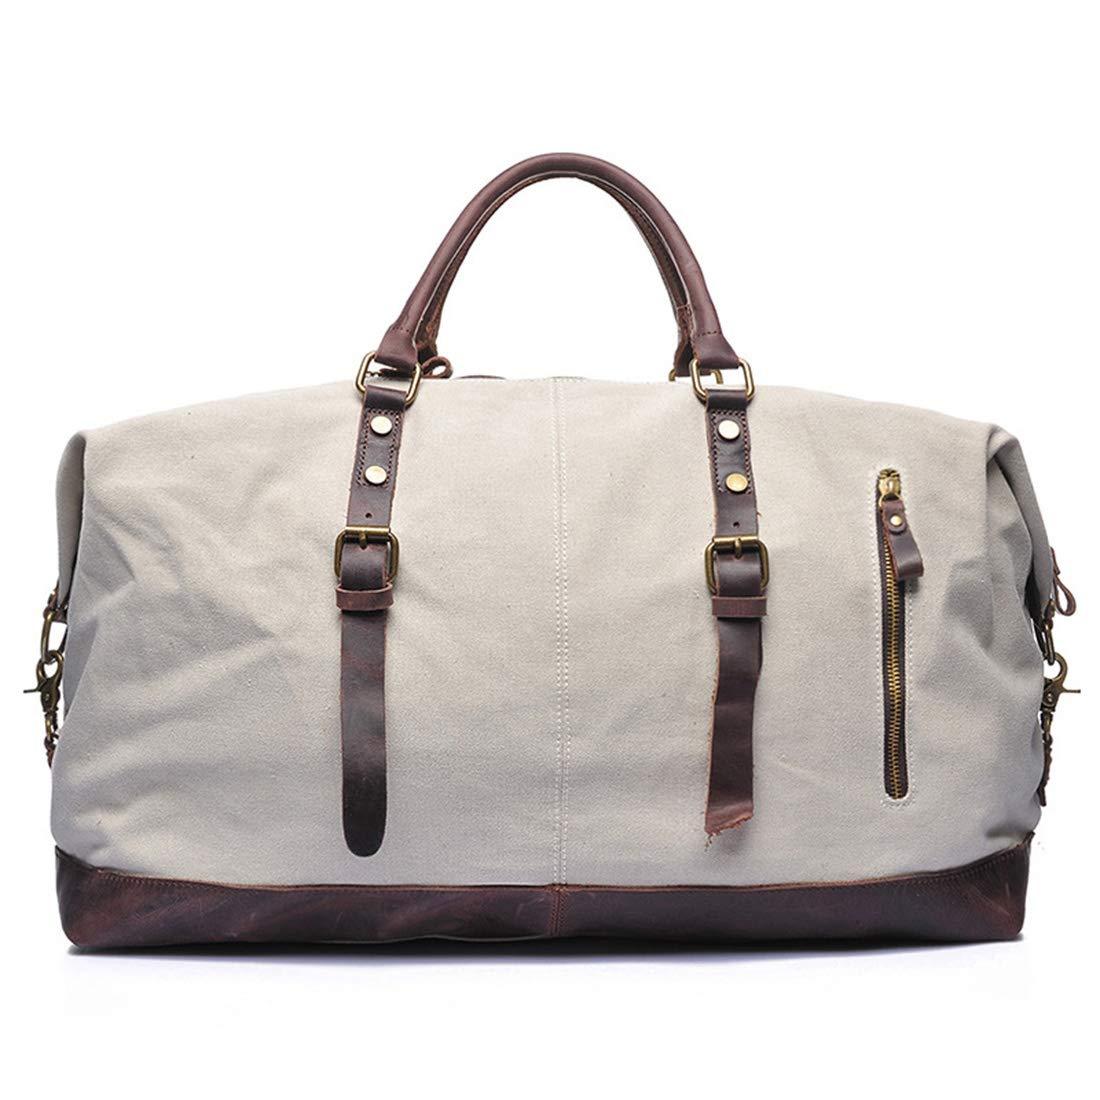 CAFUTY キャンバストラベル大容量ハンドバッグシングルショルダークロス多機能荷物袋 (Color : ホワイト)  ホワイト B07MQ7LSLF